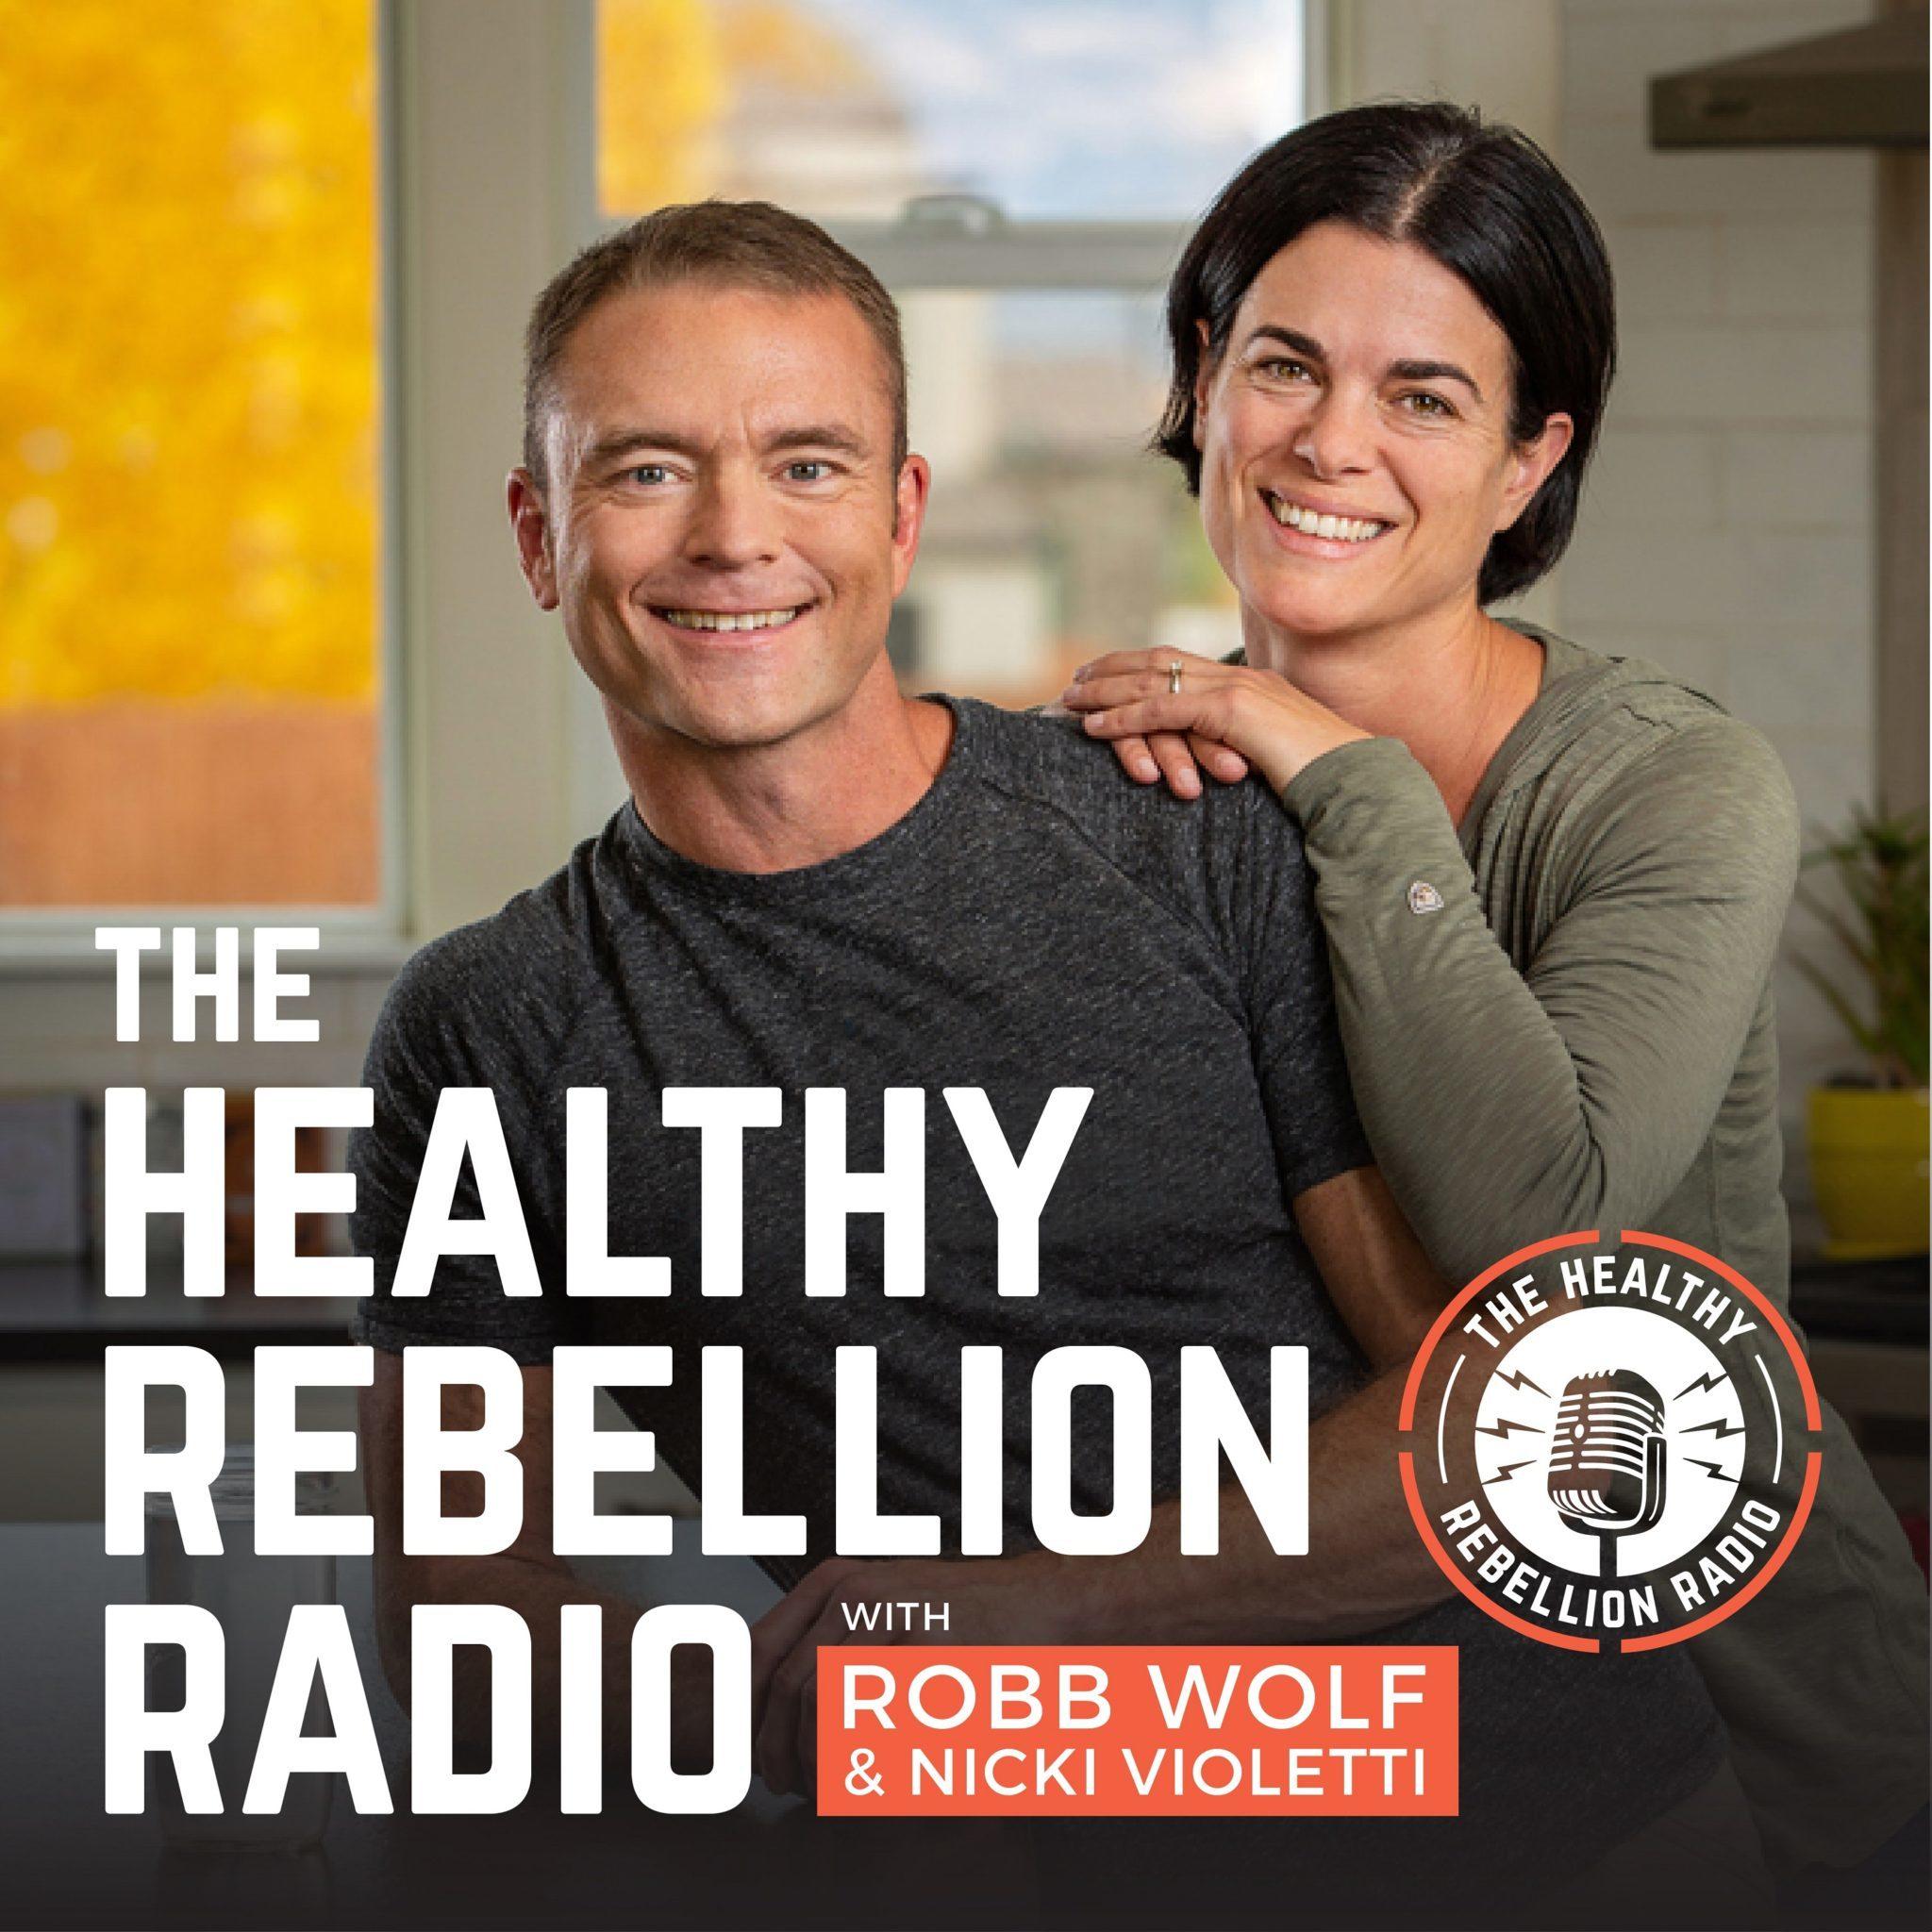 The Healthy Rebelion Radio (Robb Wolf & Nicki Violetti)